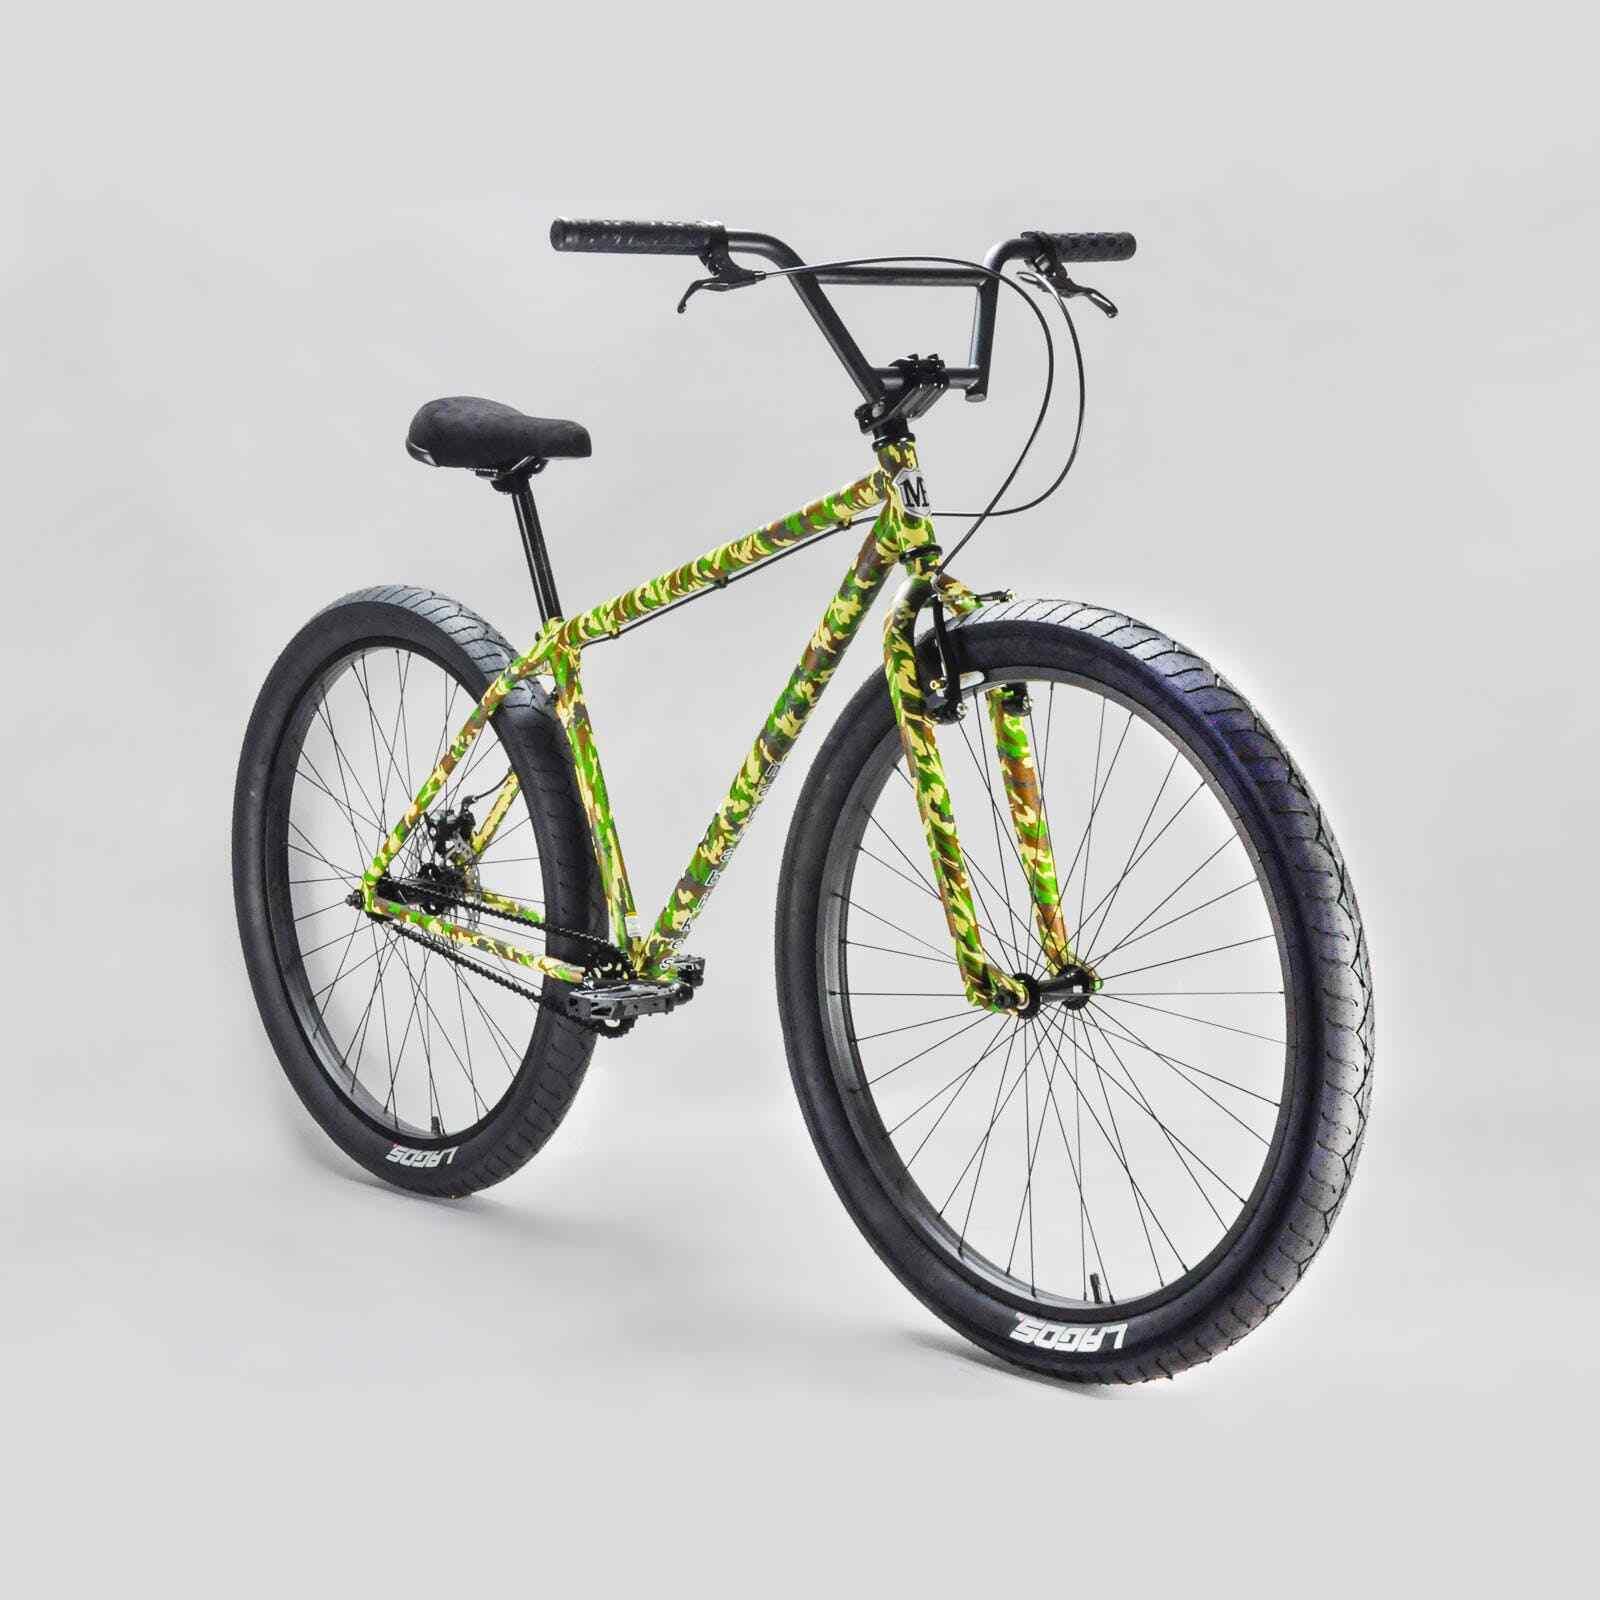 "mafiabikes Bomma 29"" Wheelie Bike - Skatehut eBay - Online only - £324.95 with code"